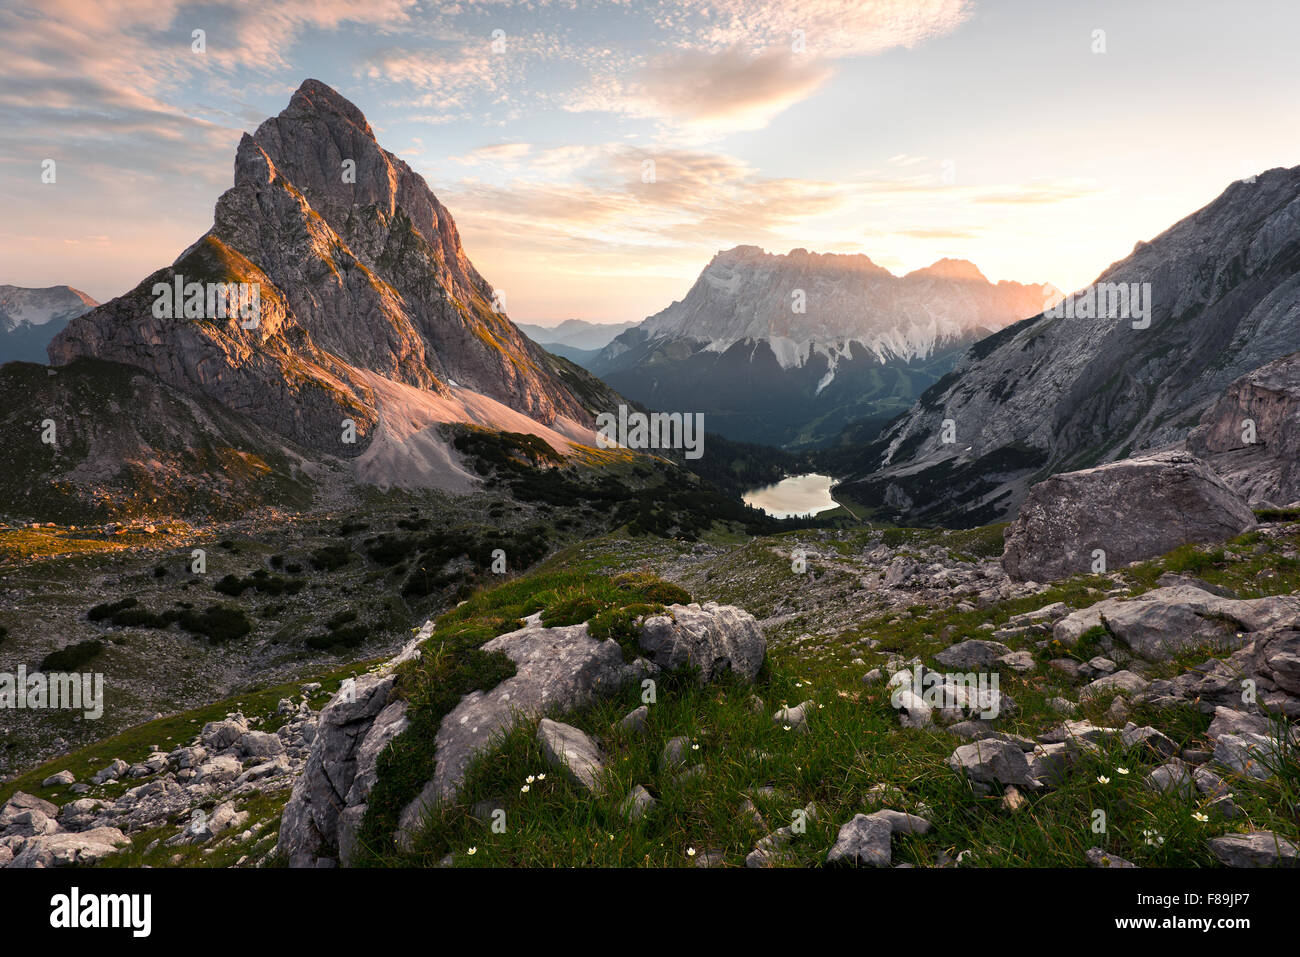 Zugspitze sonnenspitze seebensee avec et, du wetterstein, alpes, France, Europe Photo Stock